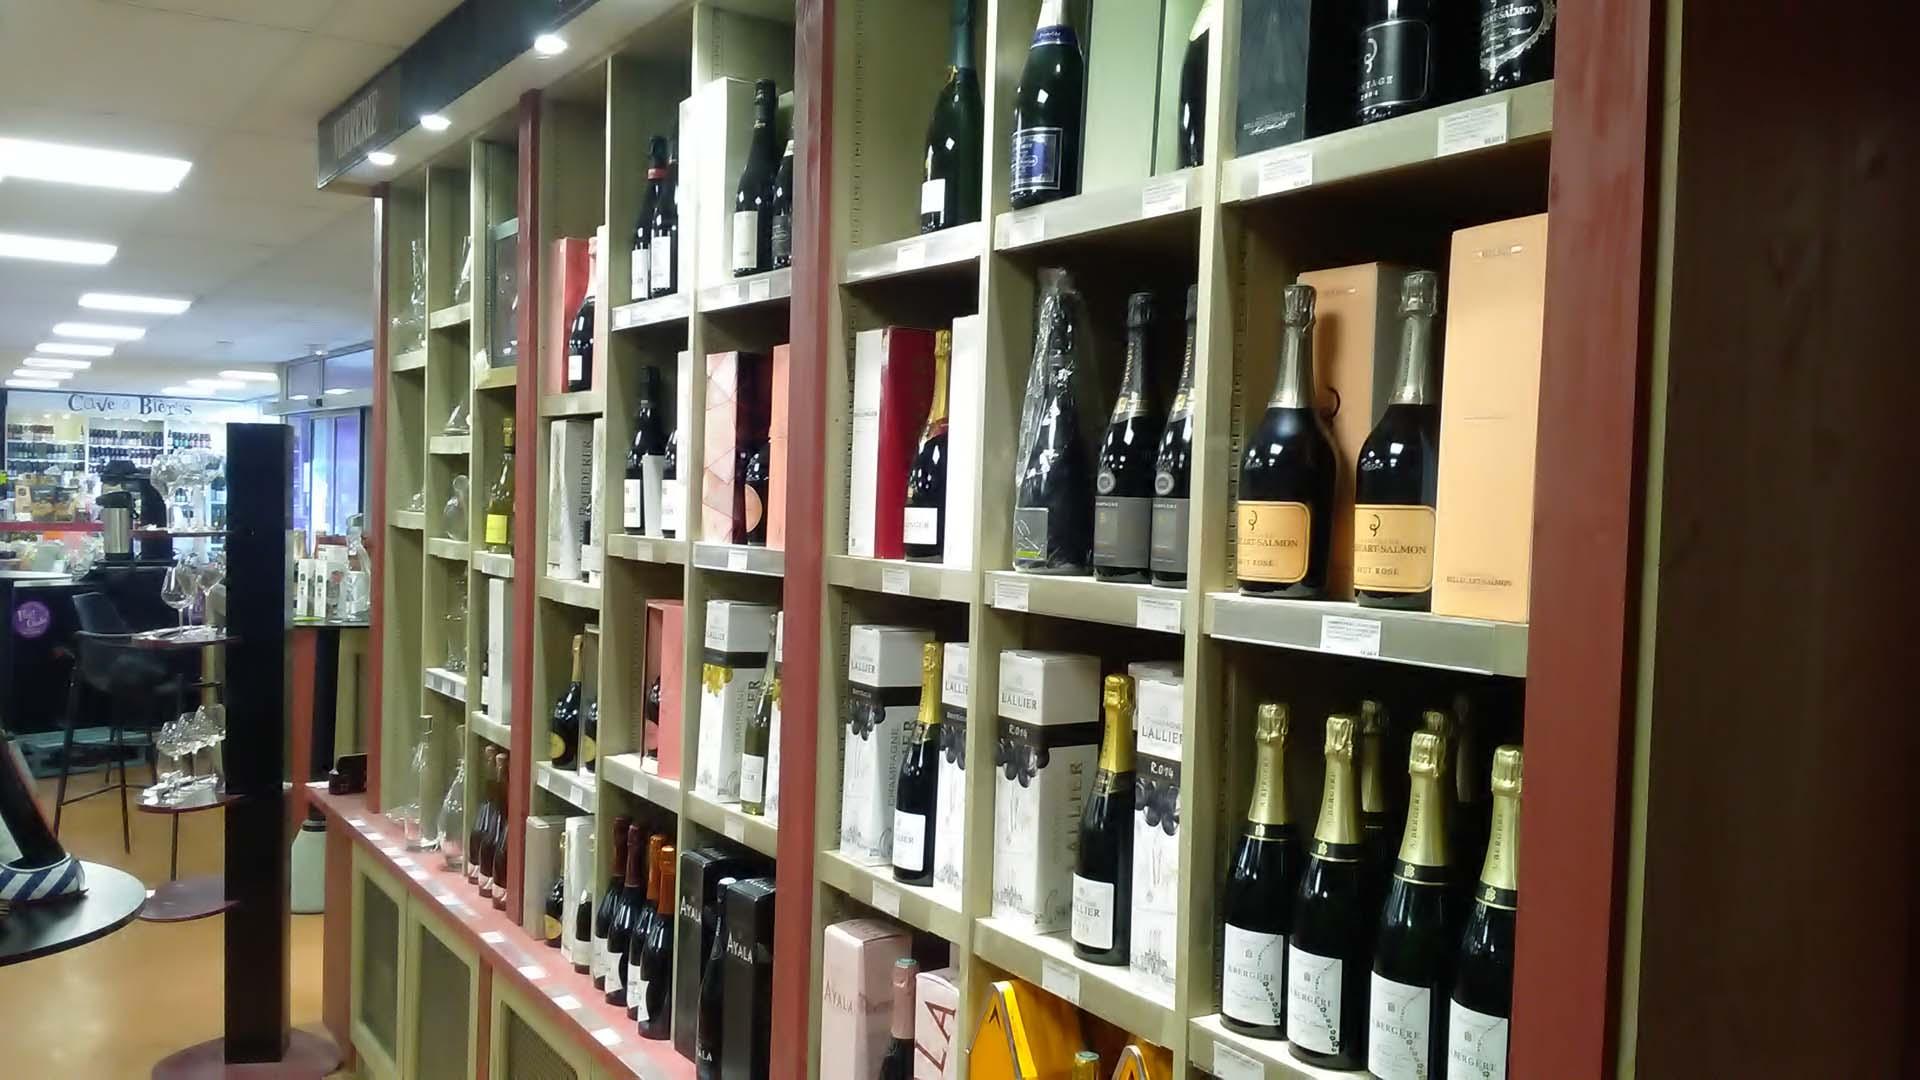 Une large sélection de spriritueux- caviste ViniGusto Lorient (Morbihan)